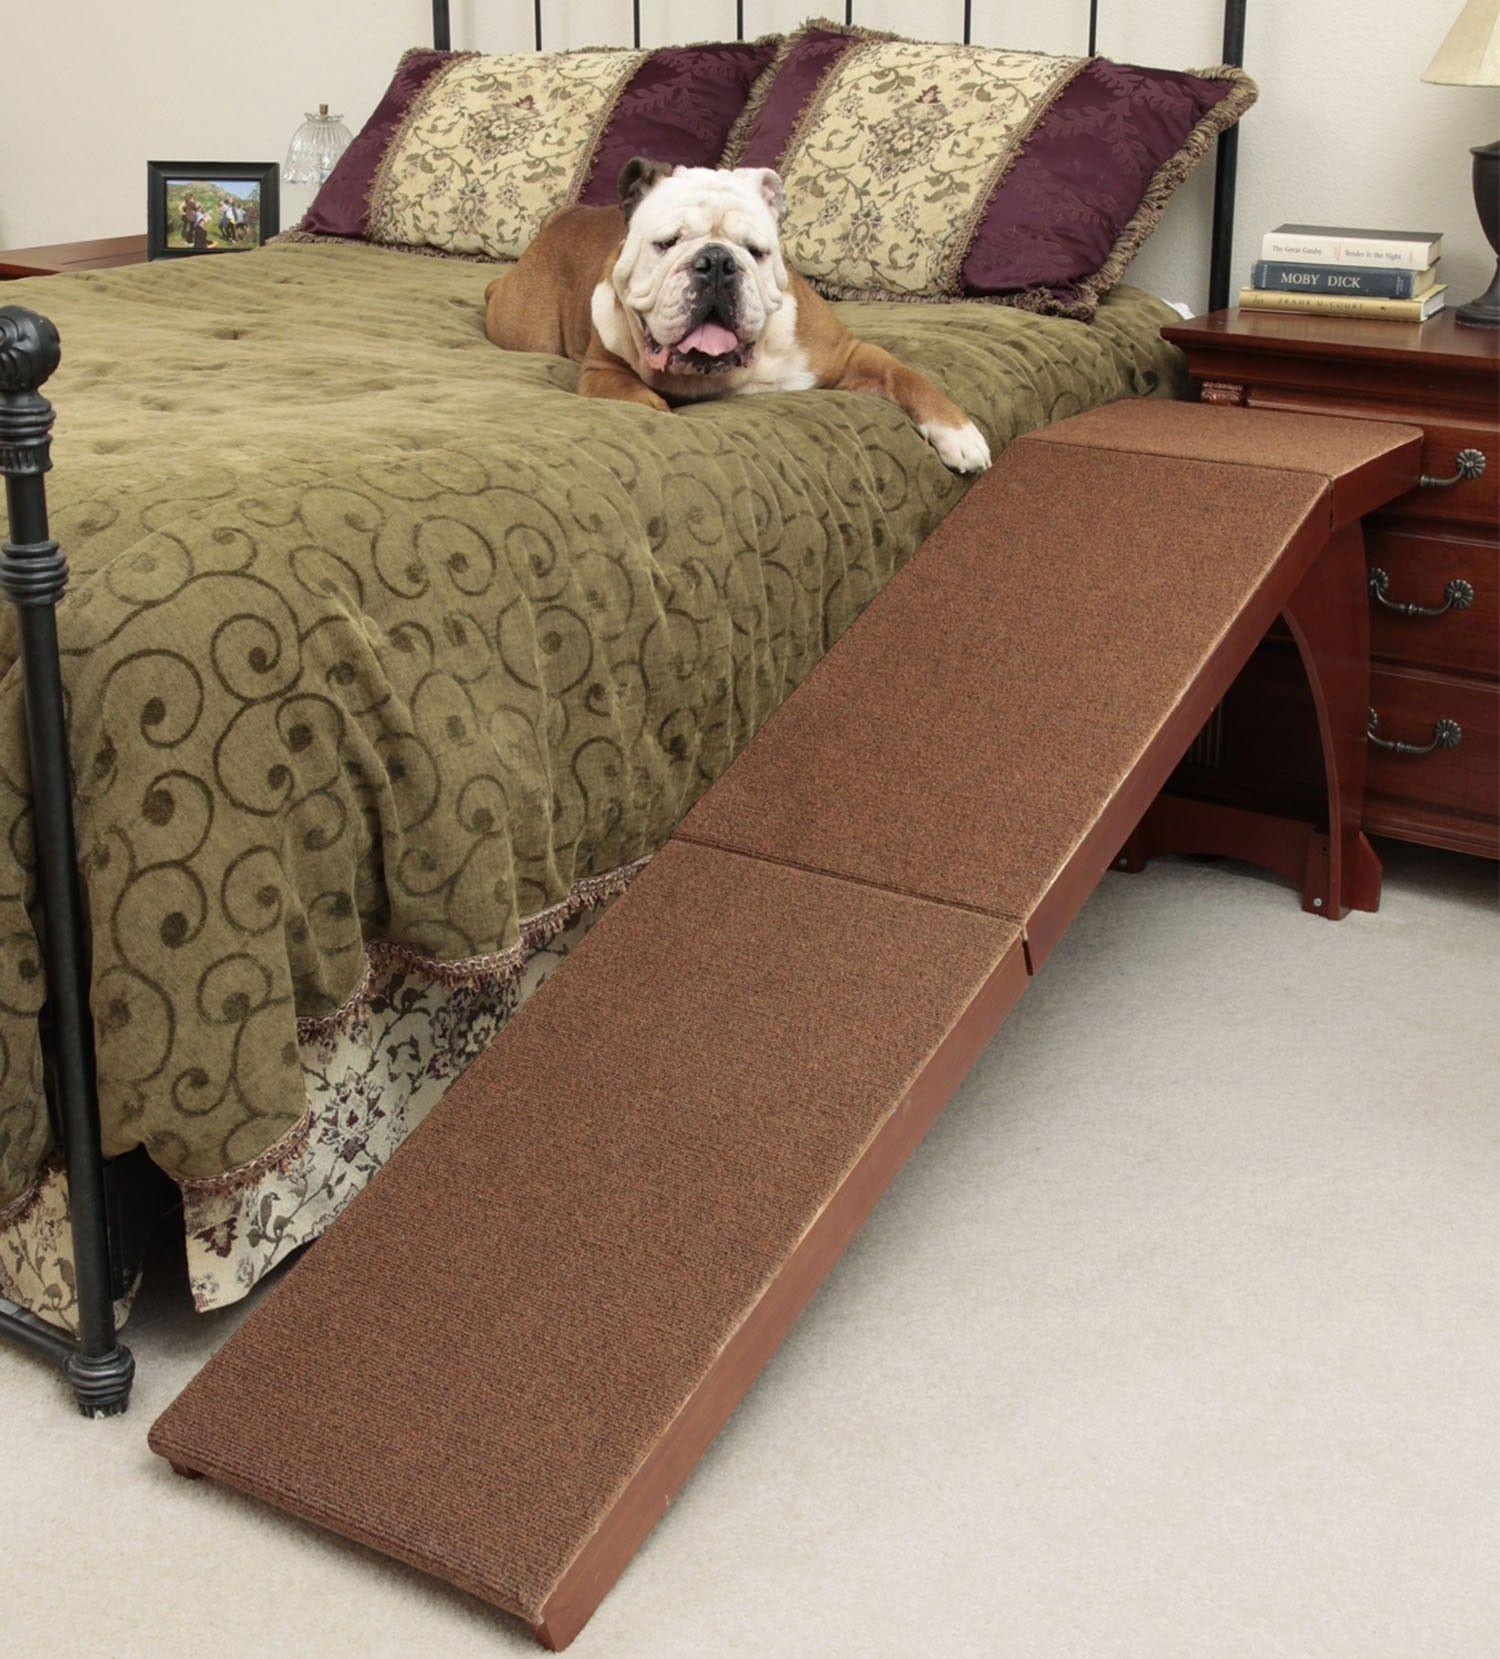 Indoor Dog Ramp Made of Oak Wood Furniture Wooden Pet Ramp for Bed